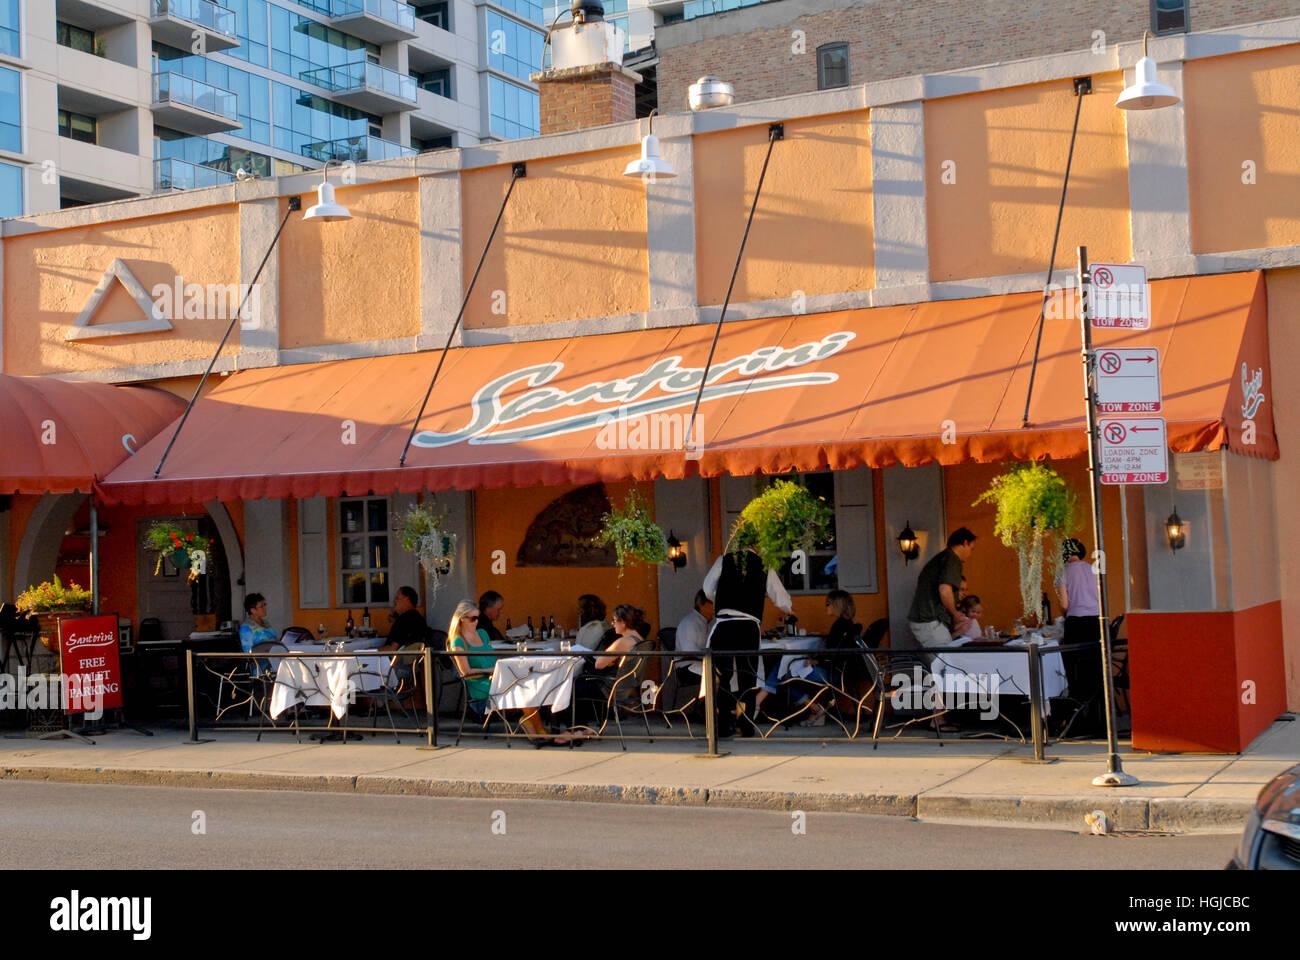 Greektown Restaurants Chicago Illinois Stock Photo 130711936 Alamy